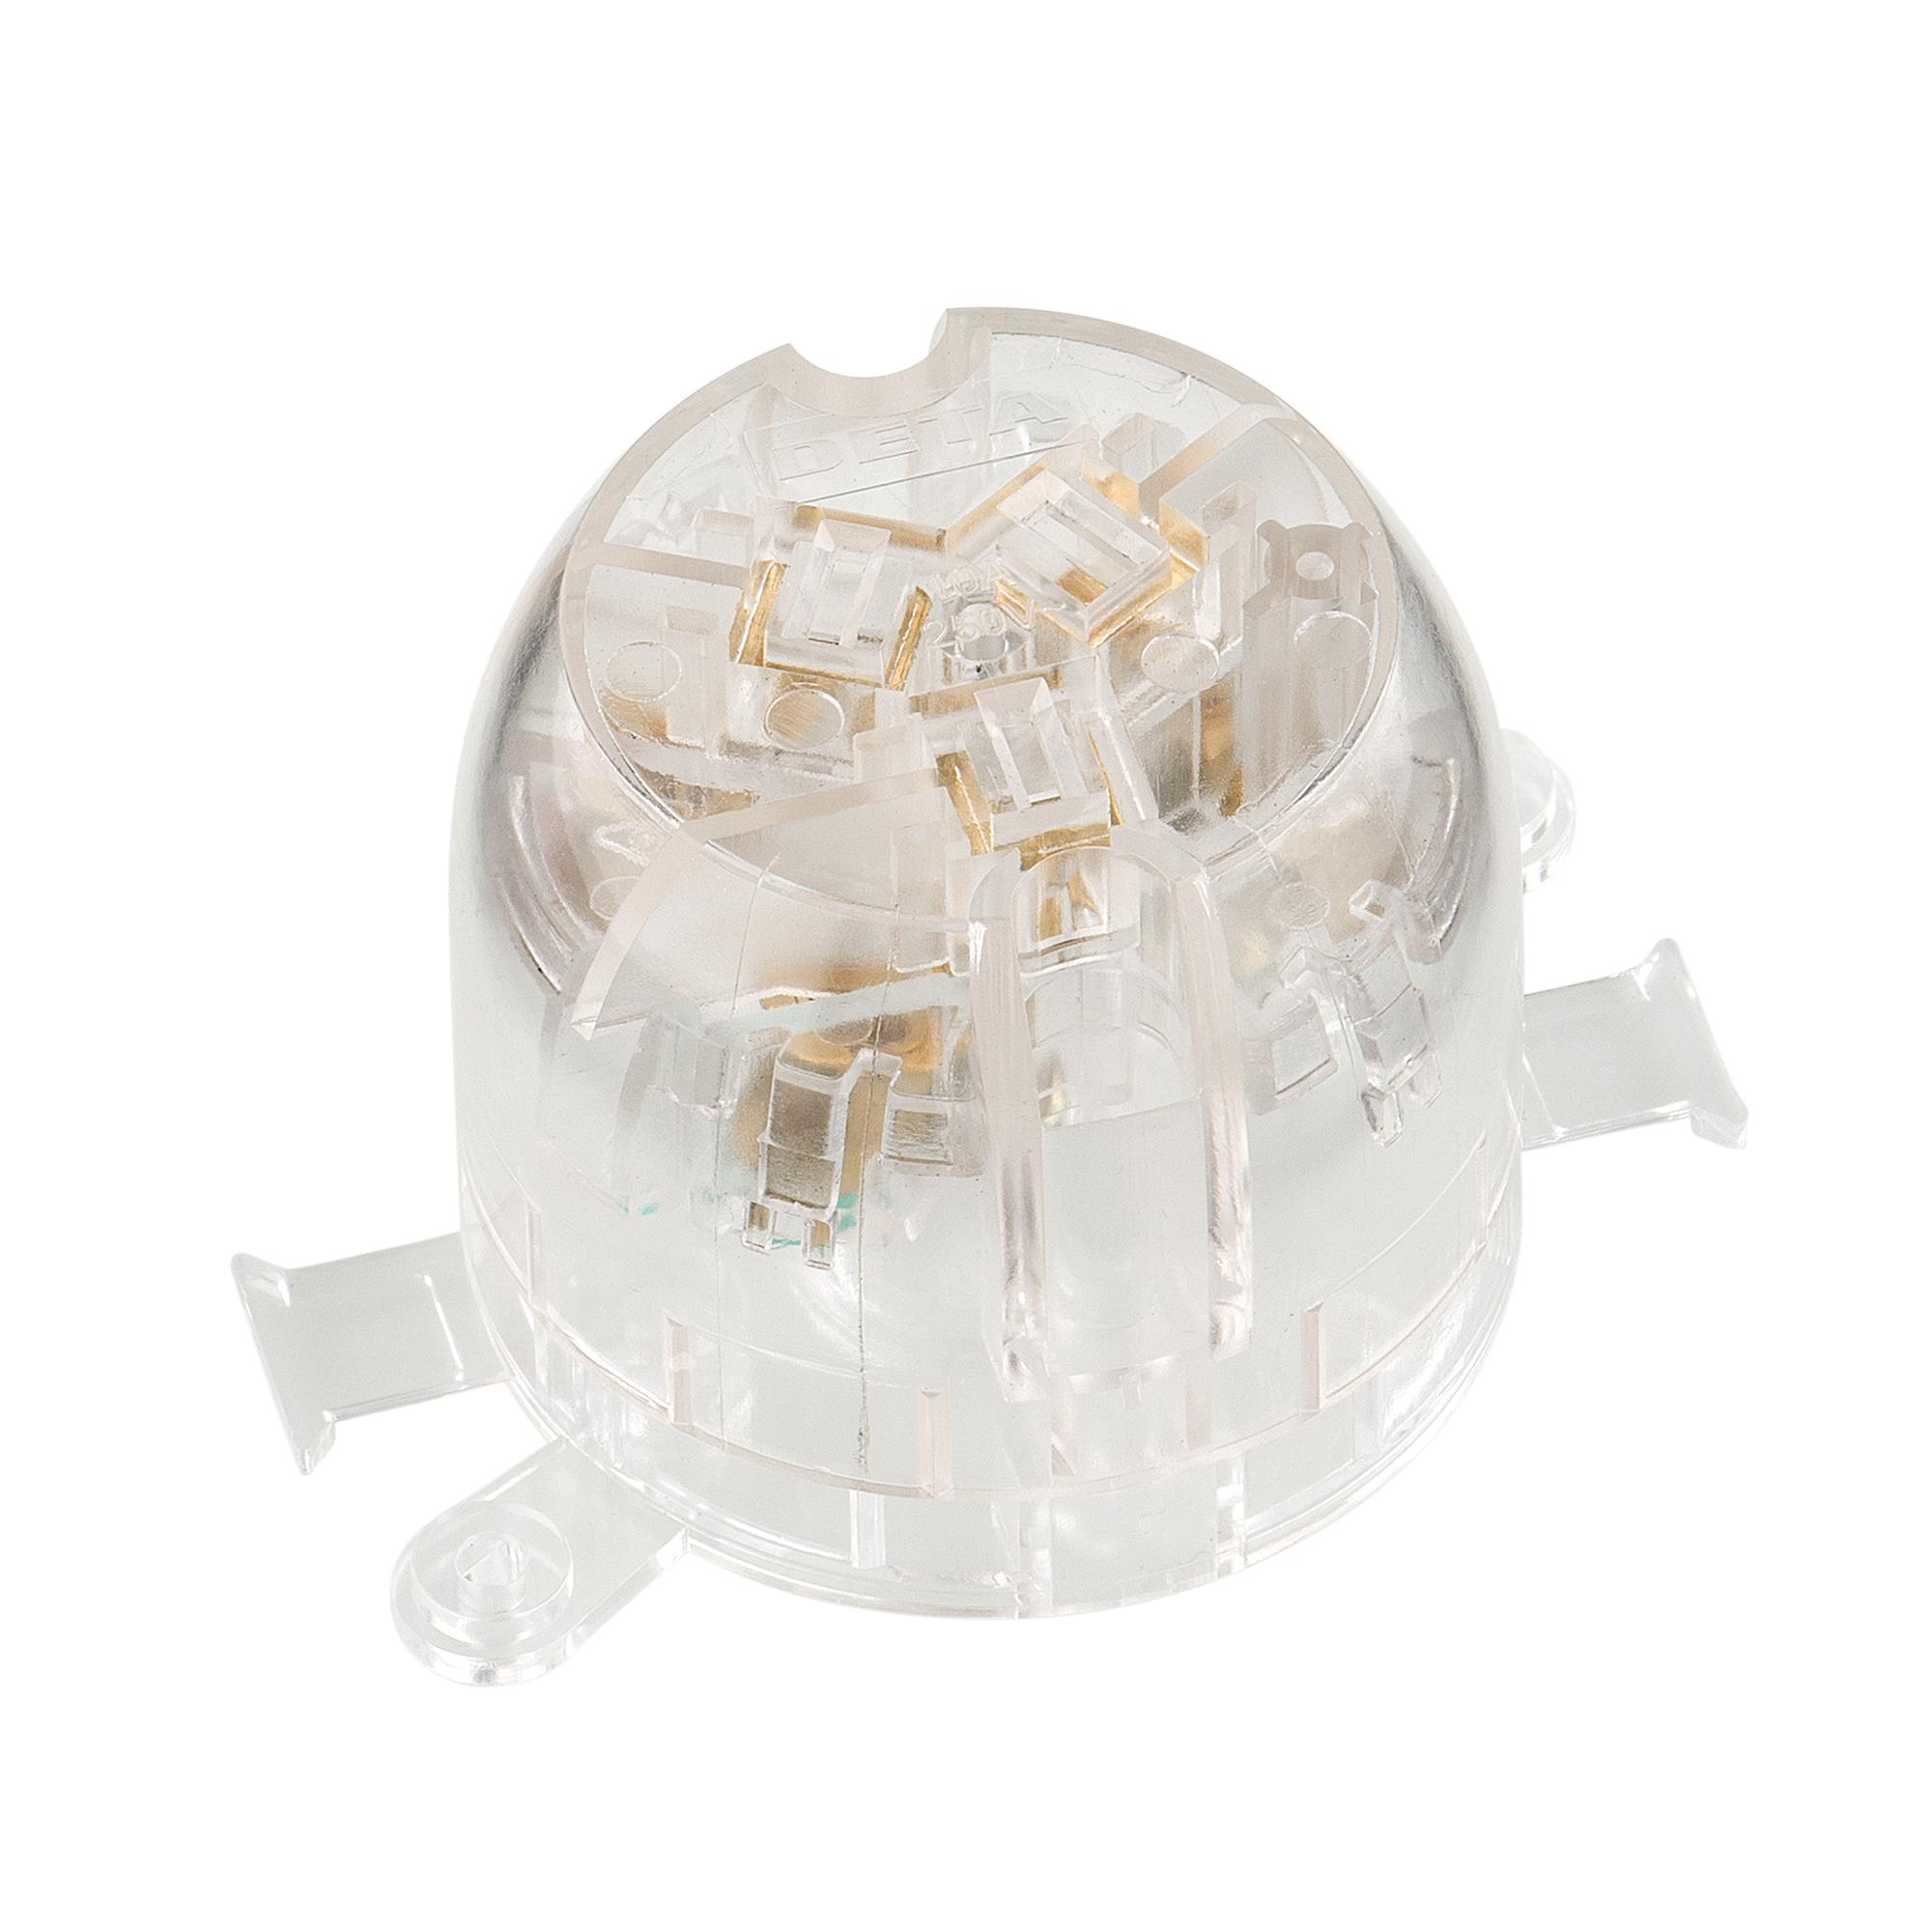 Deta 10a miniature plug base